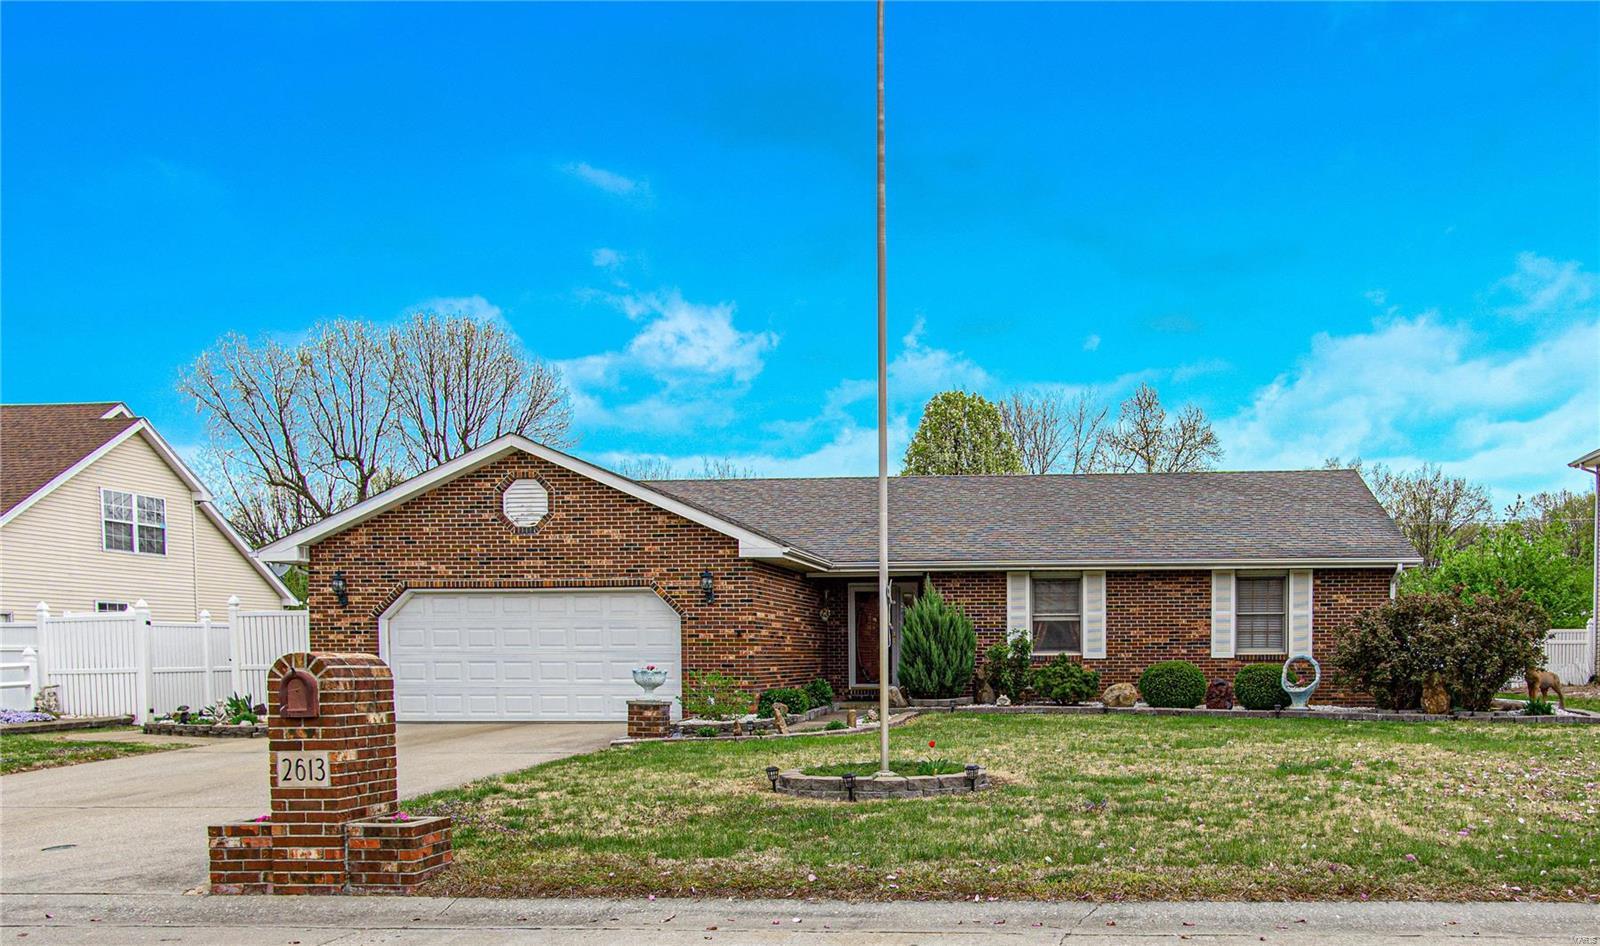 2613 Donald Ct Property Photo - Granite City, IL real estate listing